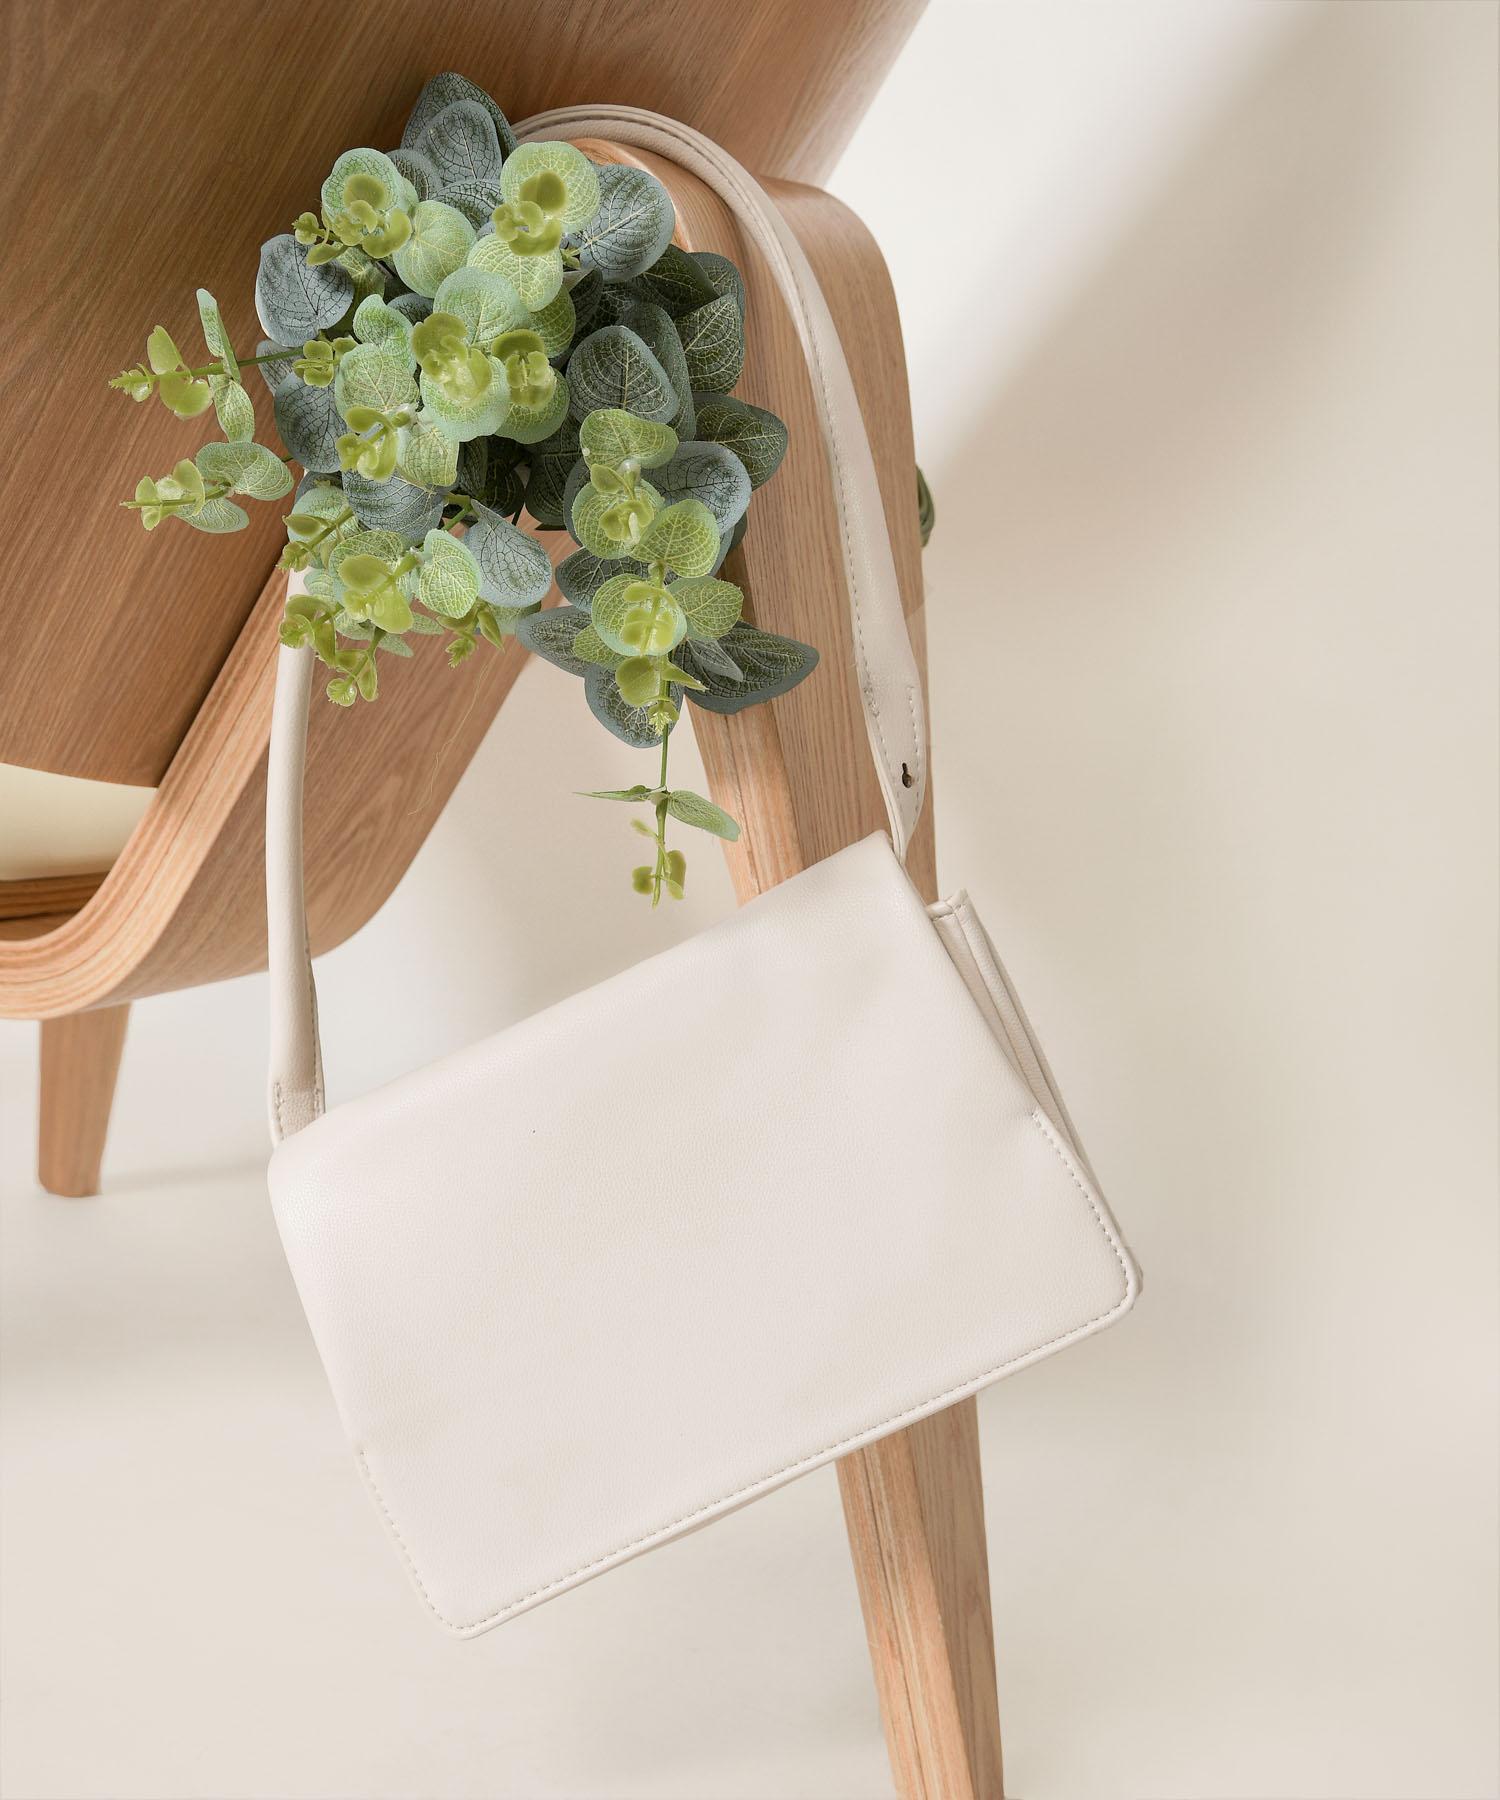 dilly-dally-foldover-bag-white-pebble-1